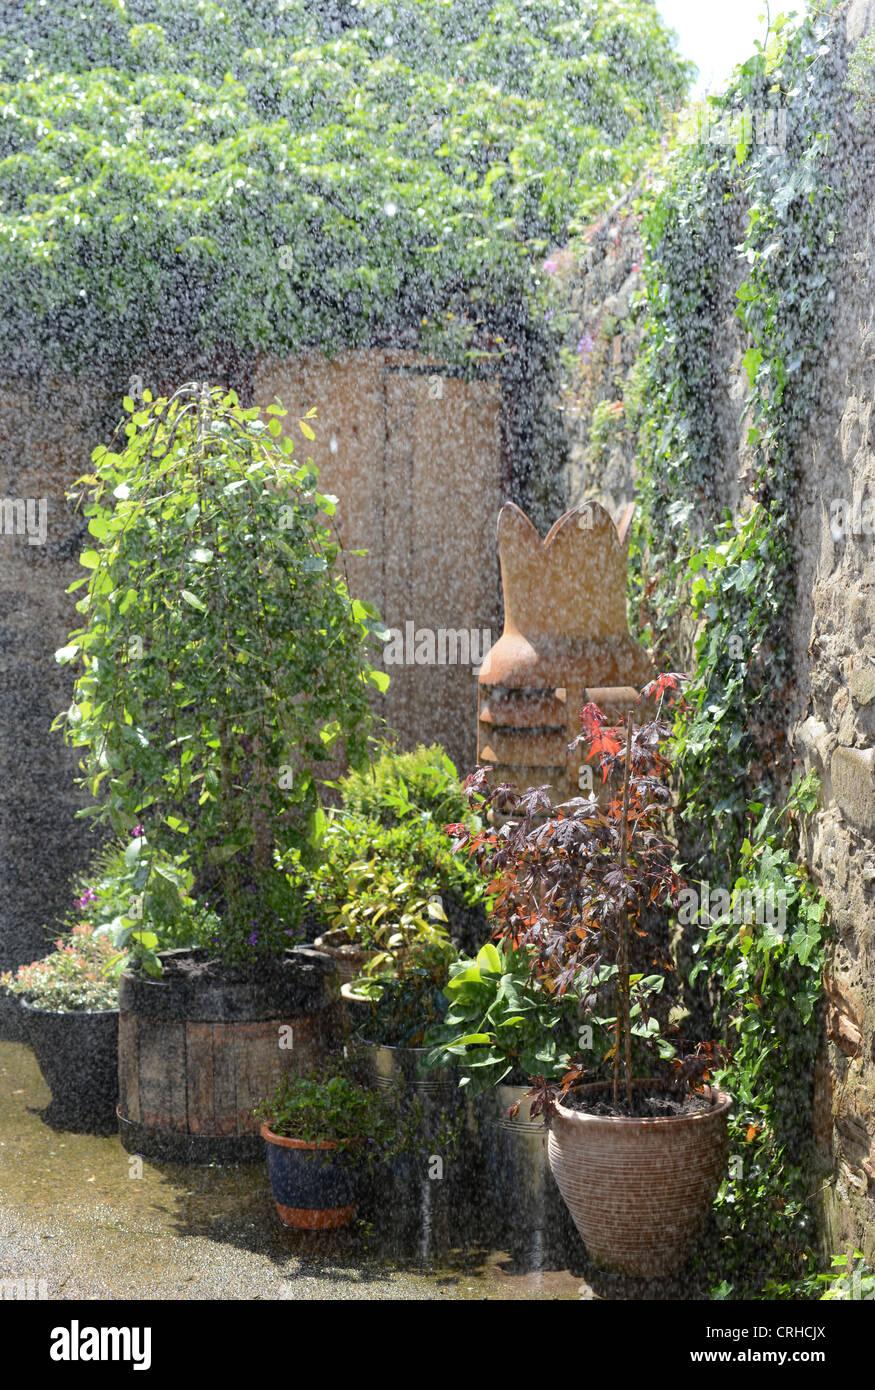 Pot garden during heavy rain while the sun shines. - Stock Image